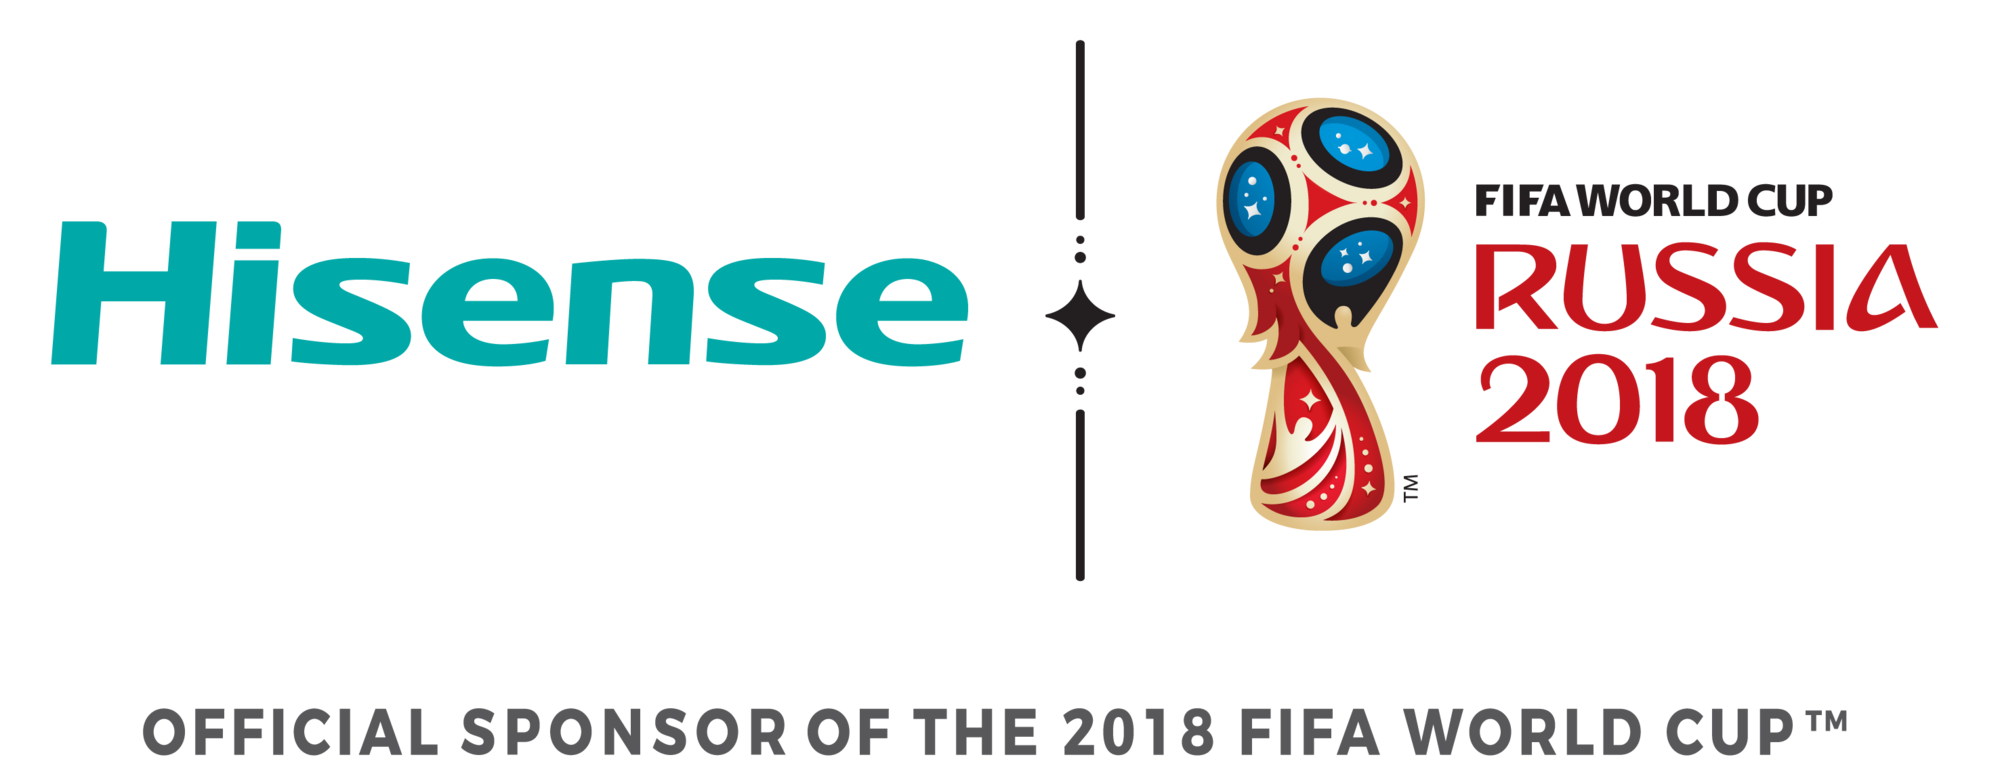 Hisense | Logopedia | FANDOM powered by Wikia